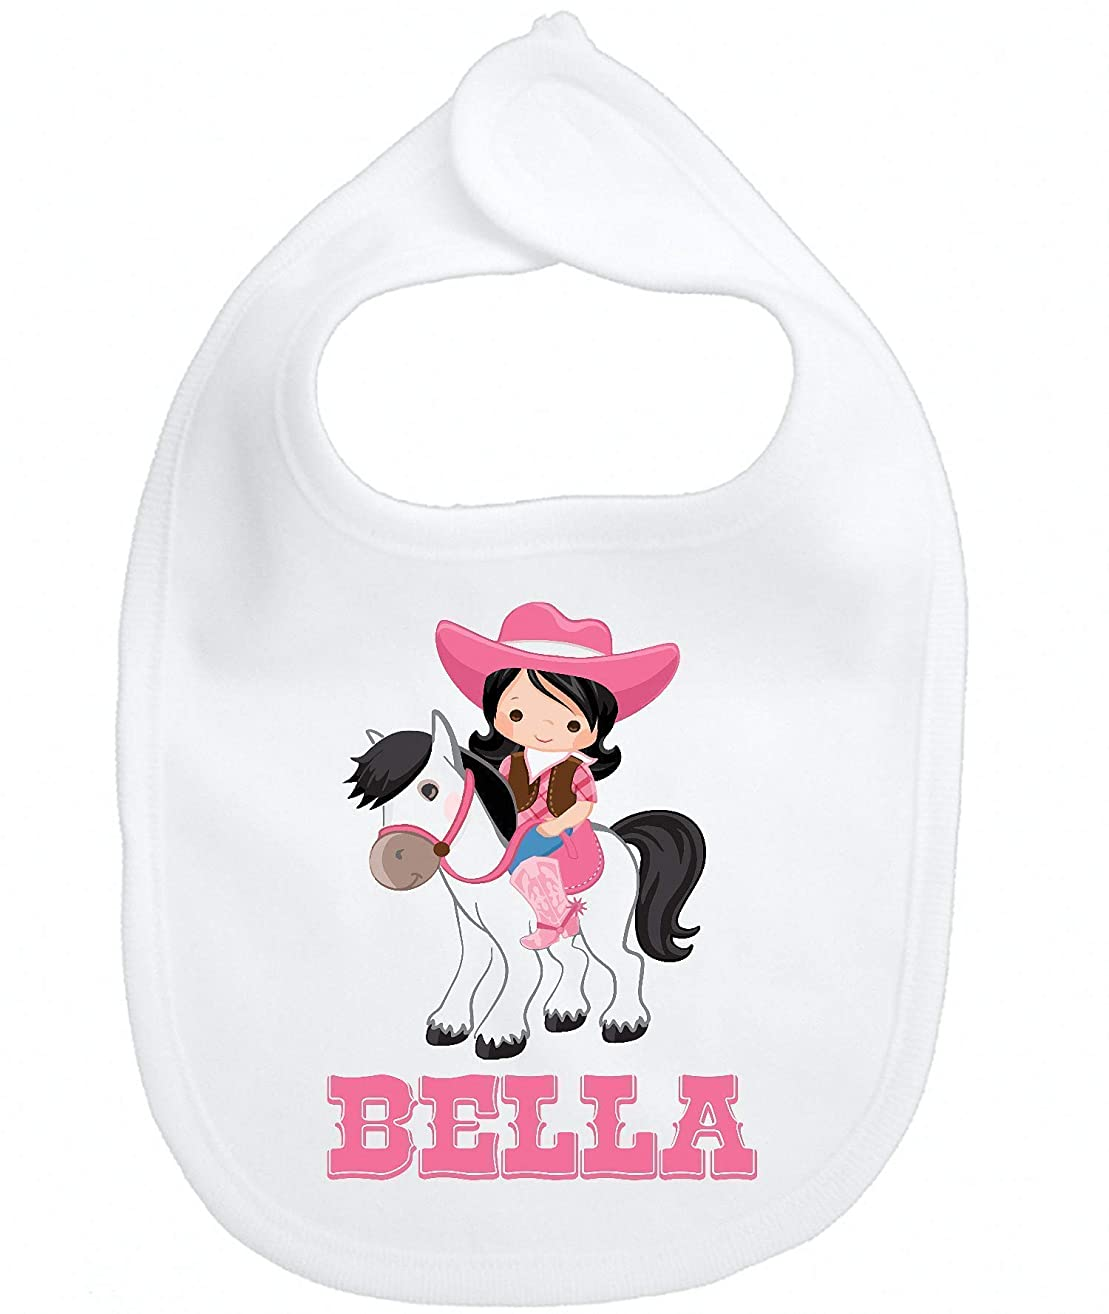 Personalized Custom Name Bib Pink Cowgirl Horse Infant Baby Girl Micro Fiber